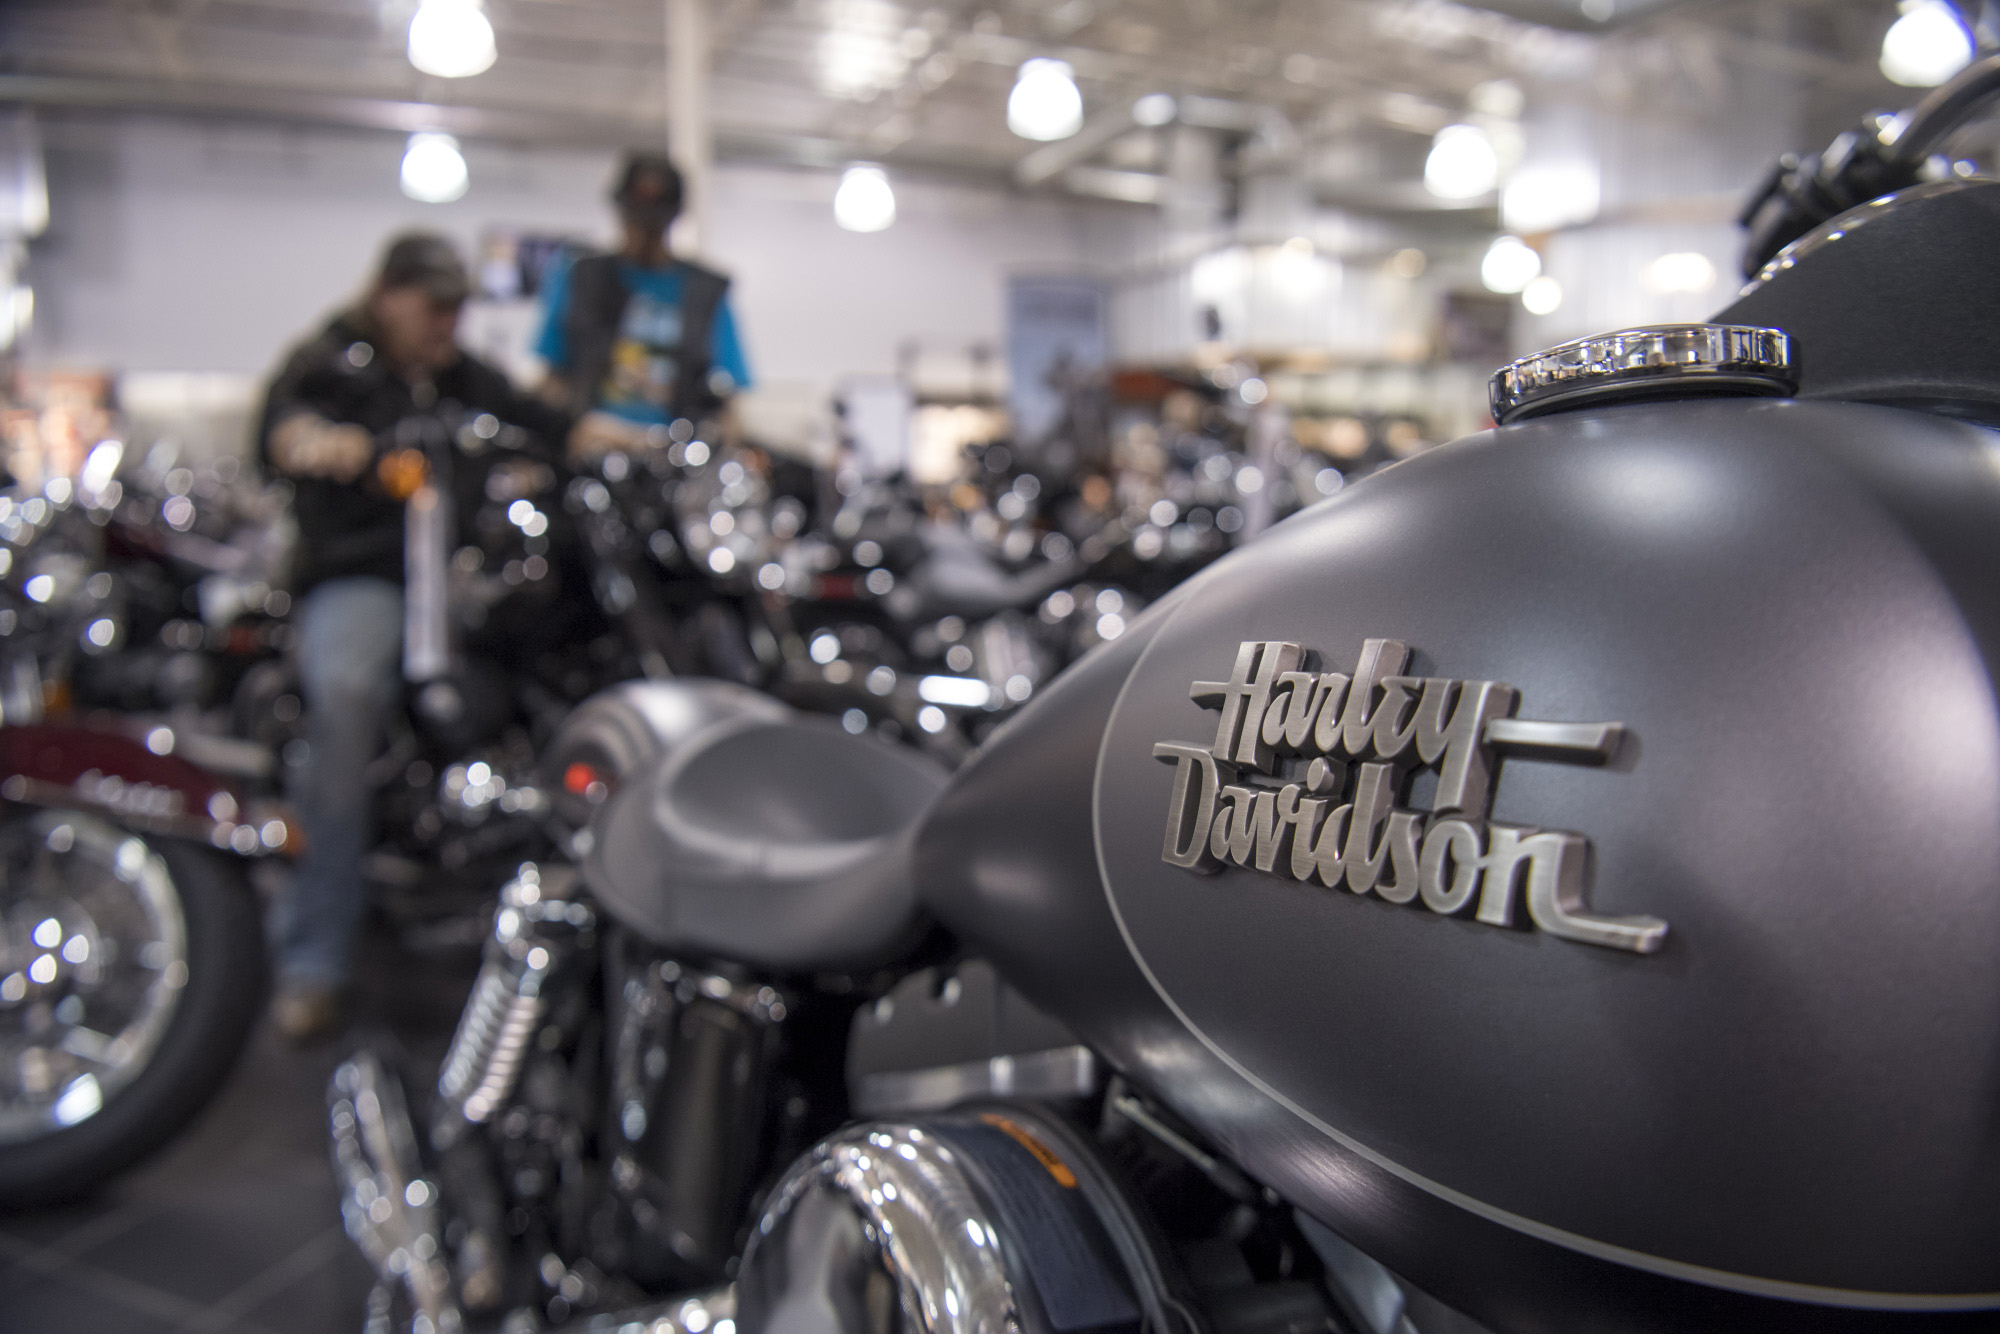 Harley davidson fuck the factory shift gone wild